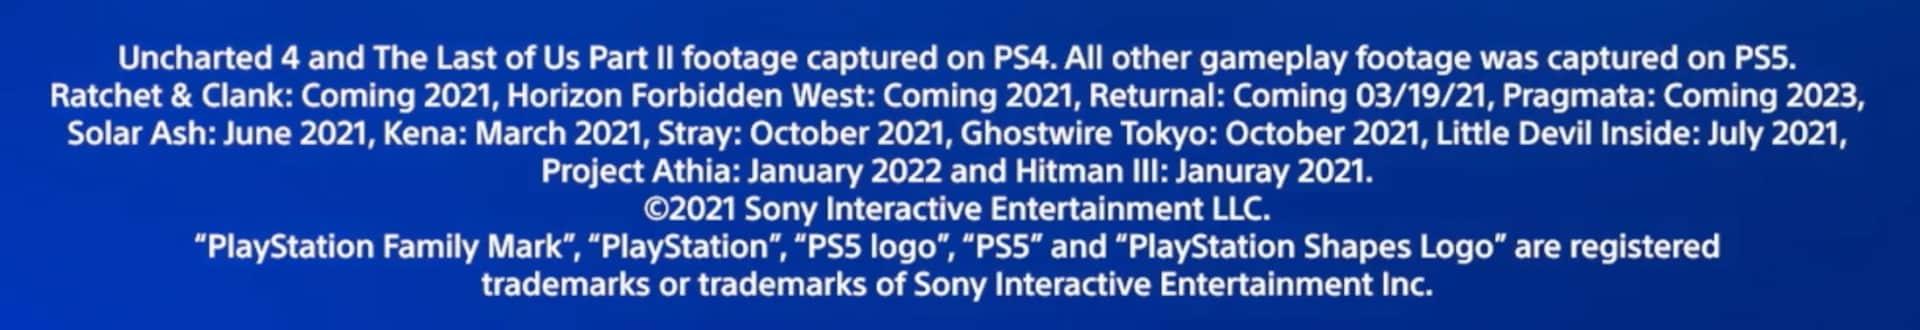 PlayStation 5 CES 2021 release dates Project Athia Stray Ghostwire Tokyo Hitman III Pragmata